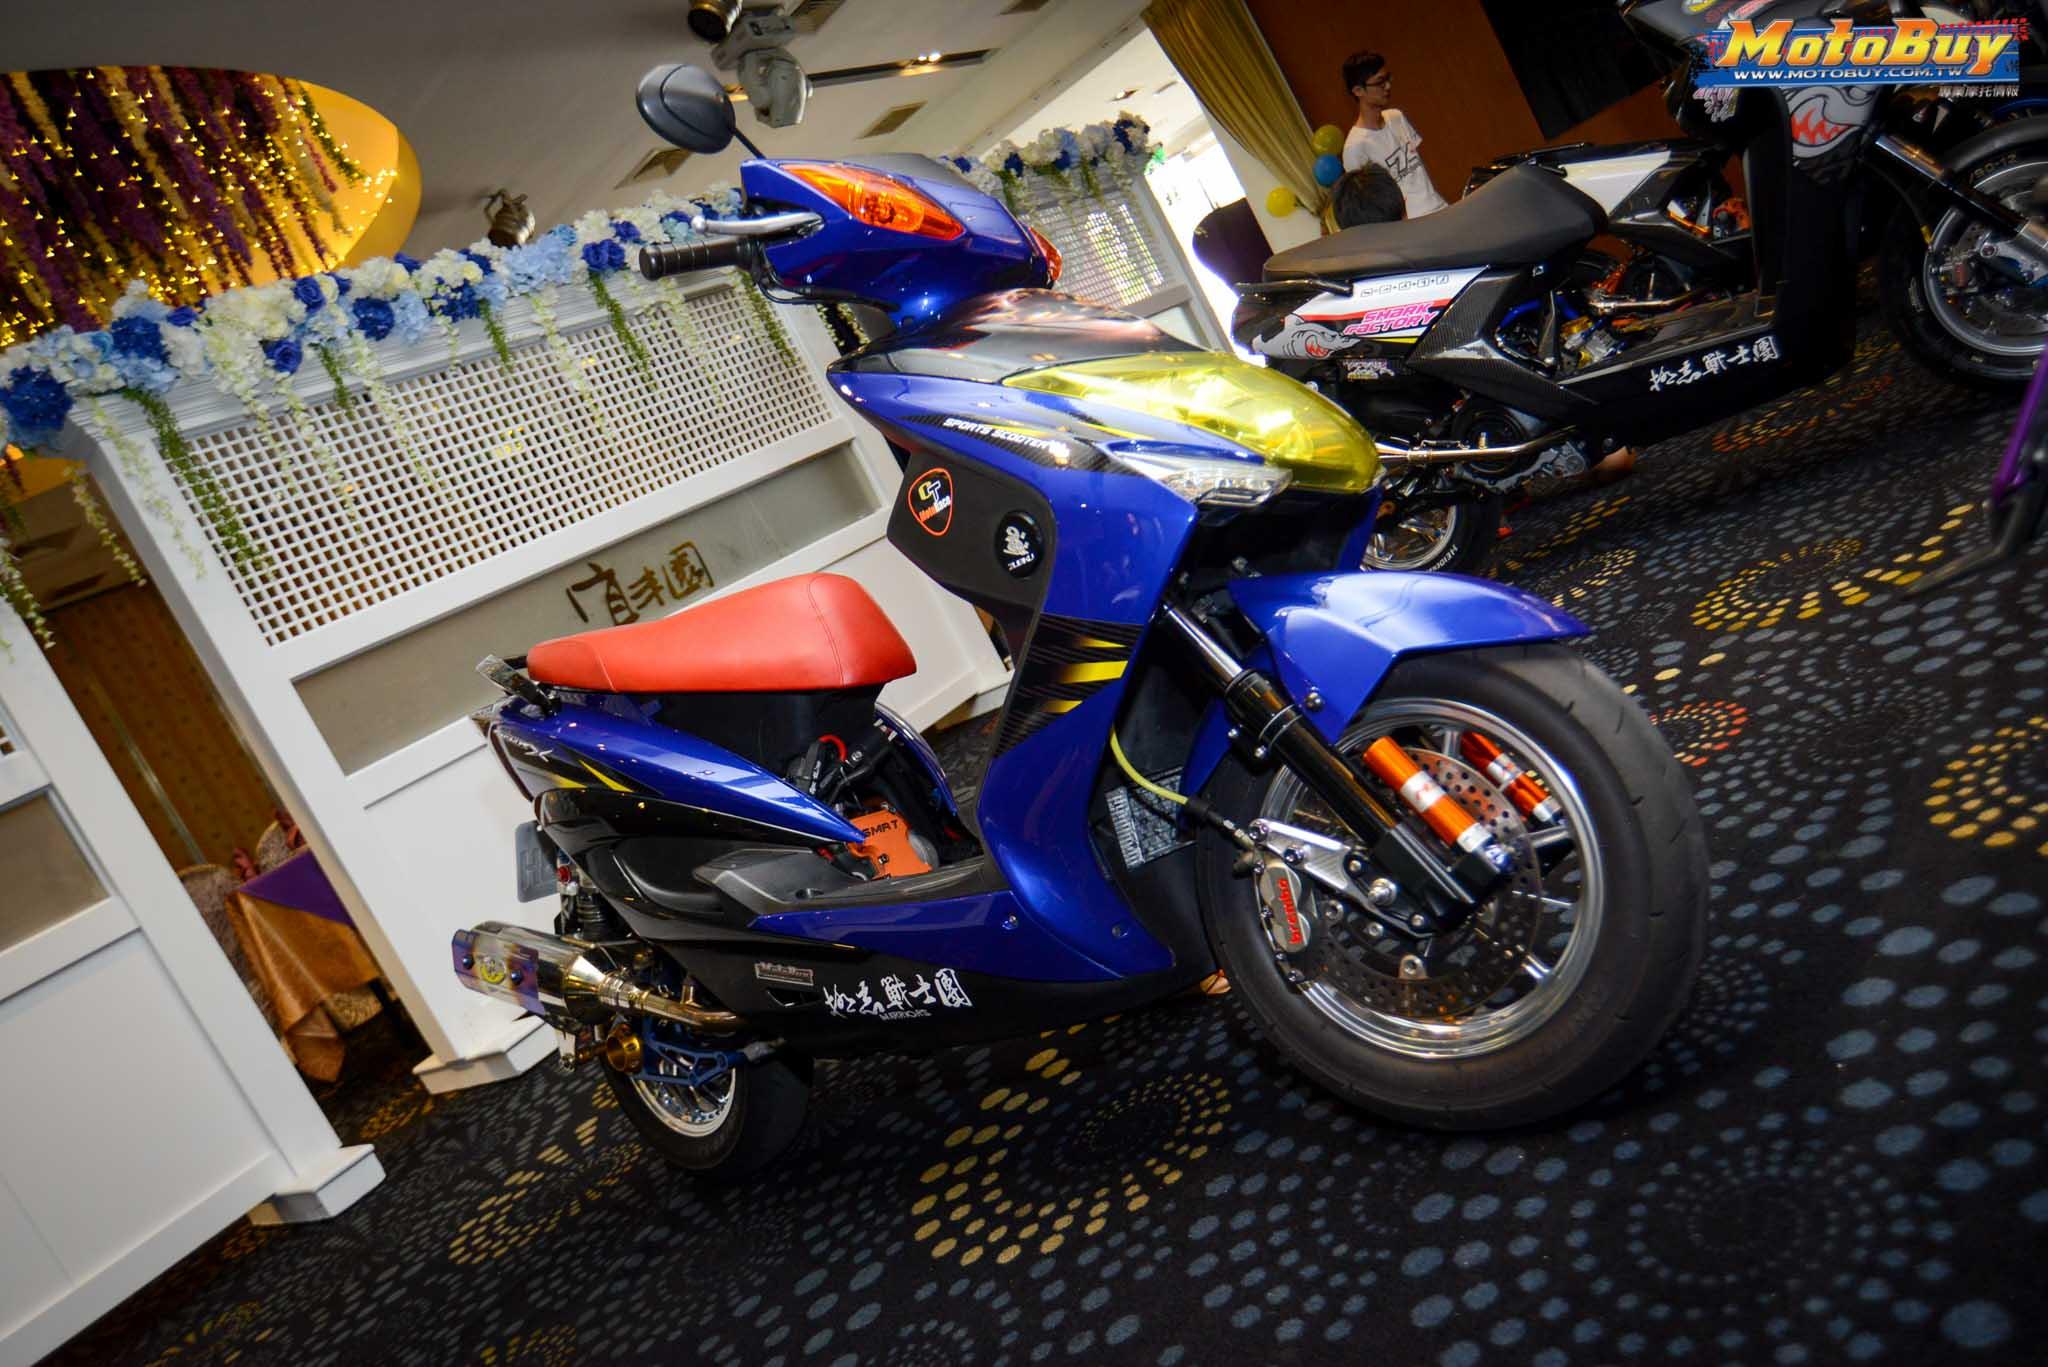 [夯車分享] 最速麥當勞外送車!YAMAHA CYGNUS-X 125   MotoBuy